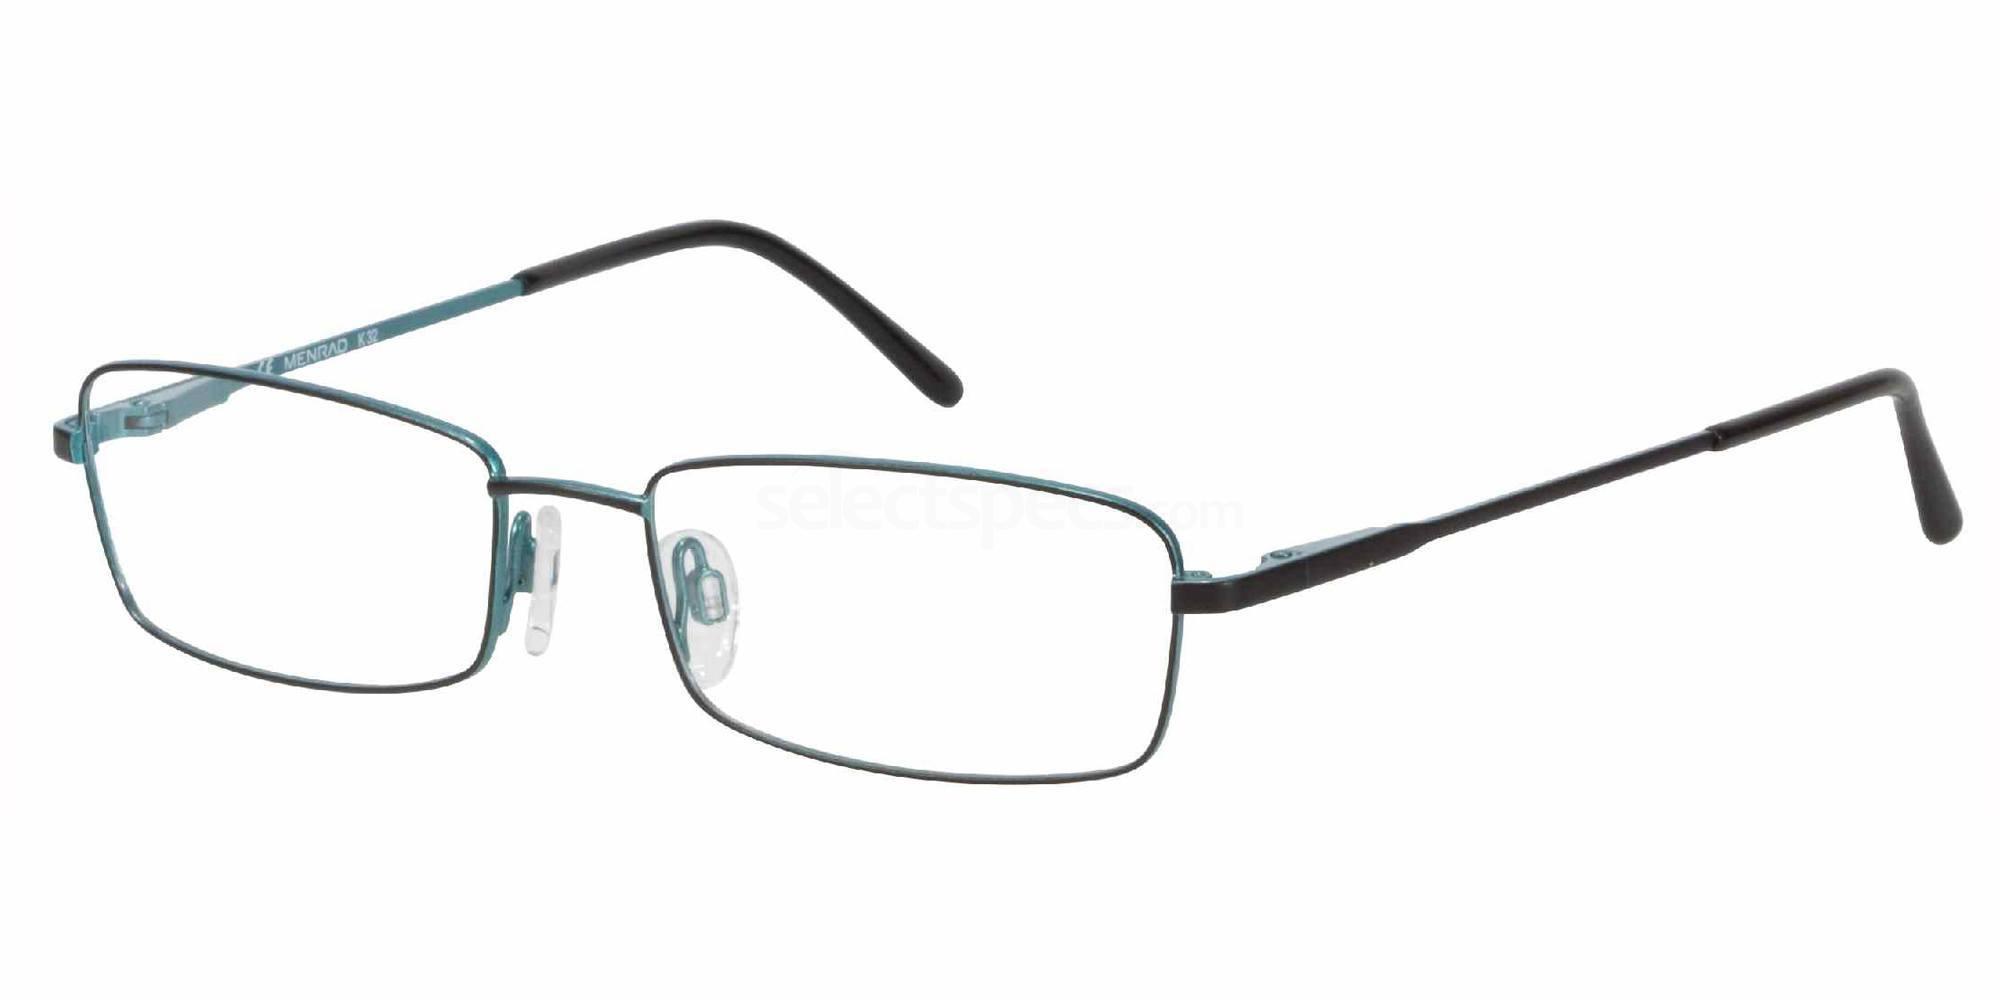 1488 13908 , MENRAD Eyewear